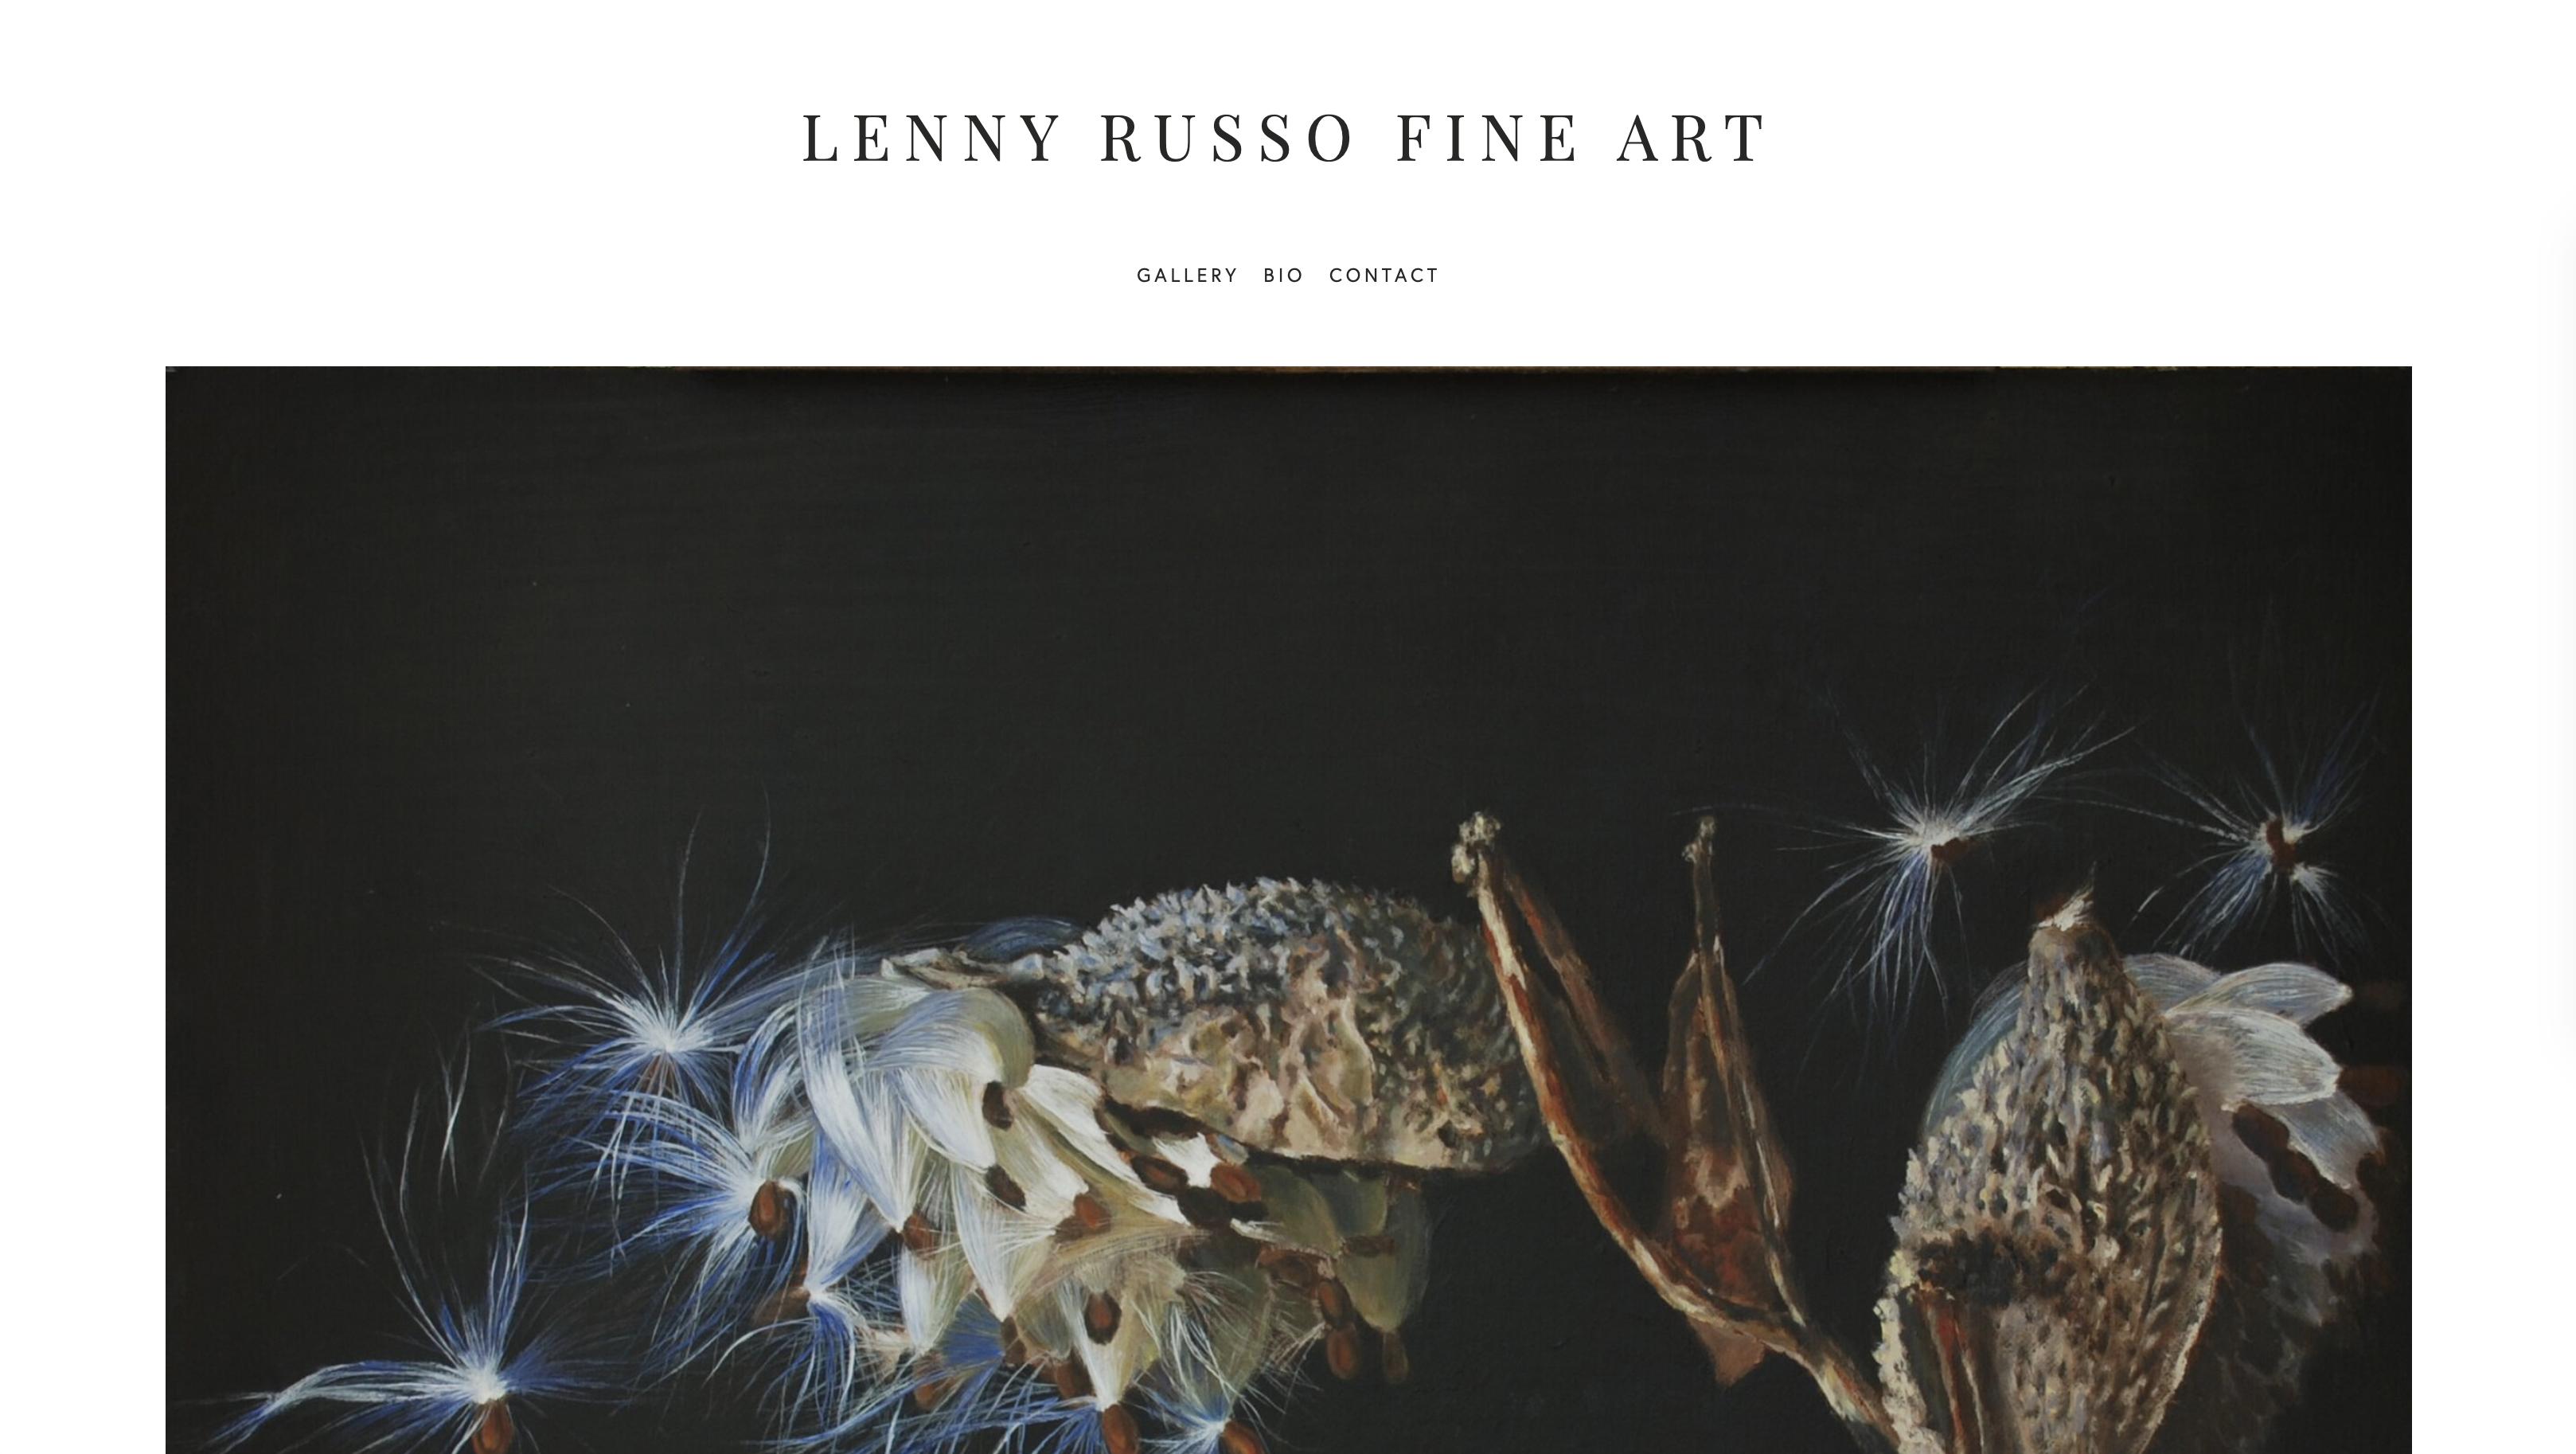 Lenny Russo Fine Art